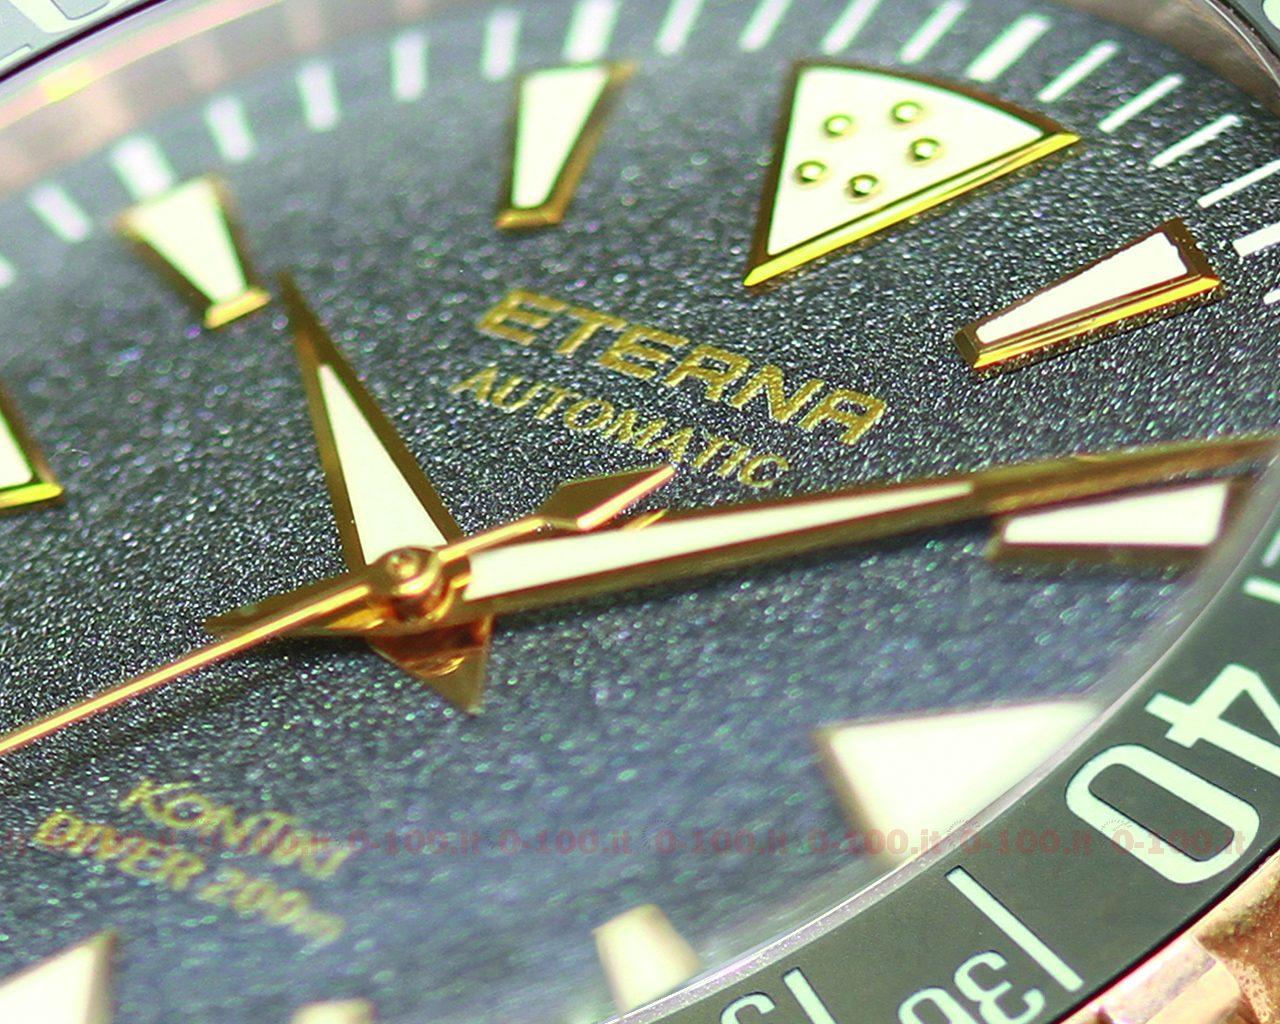 anteprima-baselworld-2017-eterna-kontiki-bronze-manufacture-limited-edition-ref-1291-78-49-1422-prezzo-price_0-1002